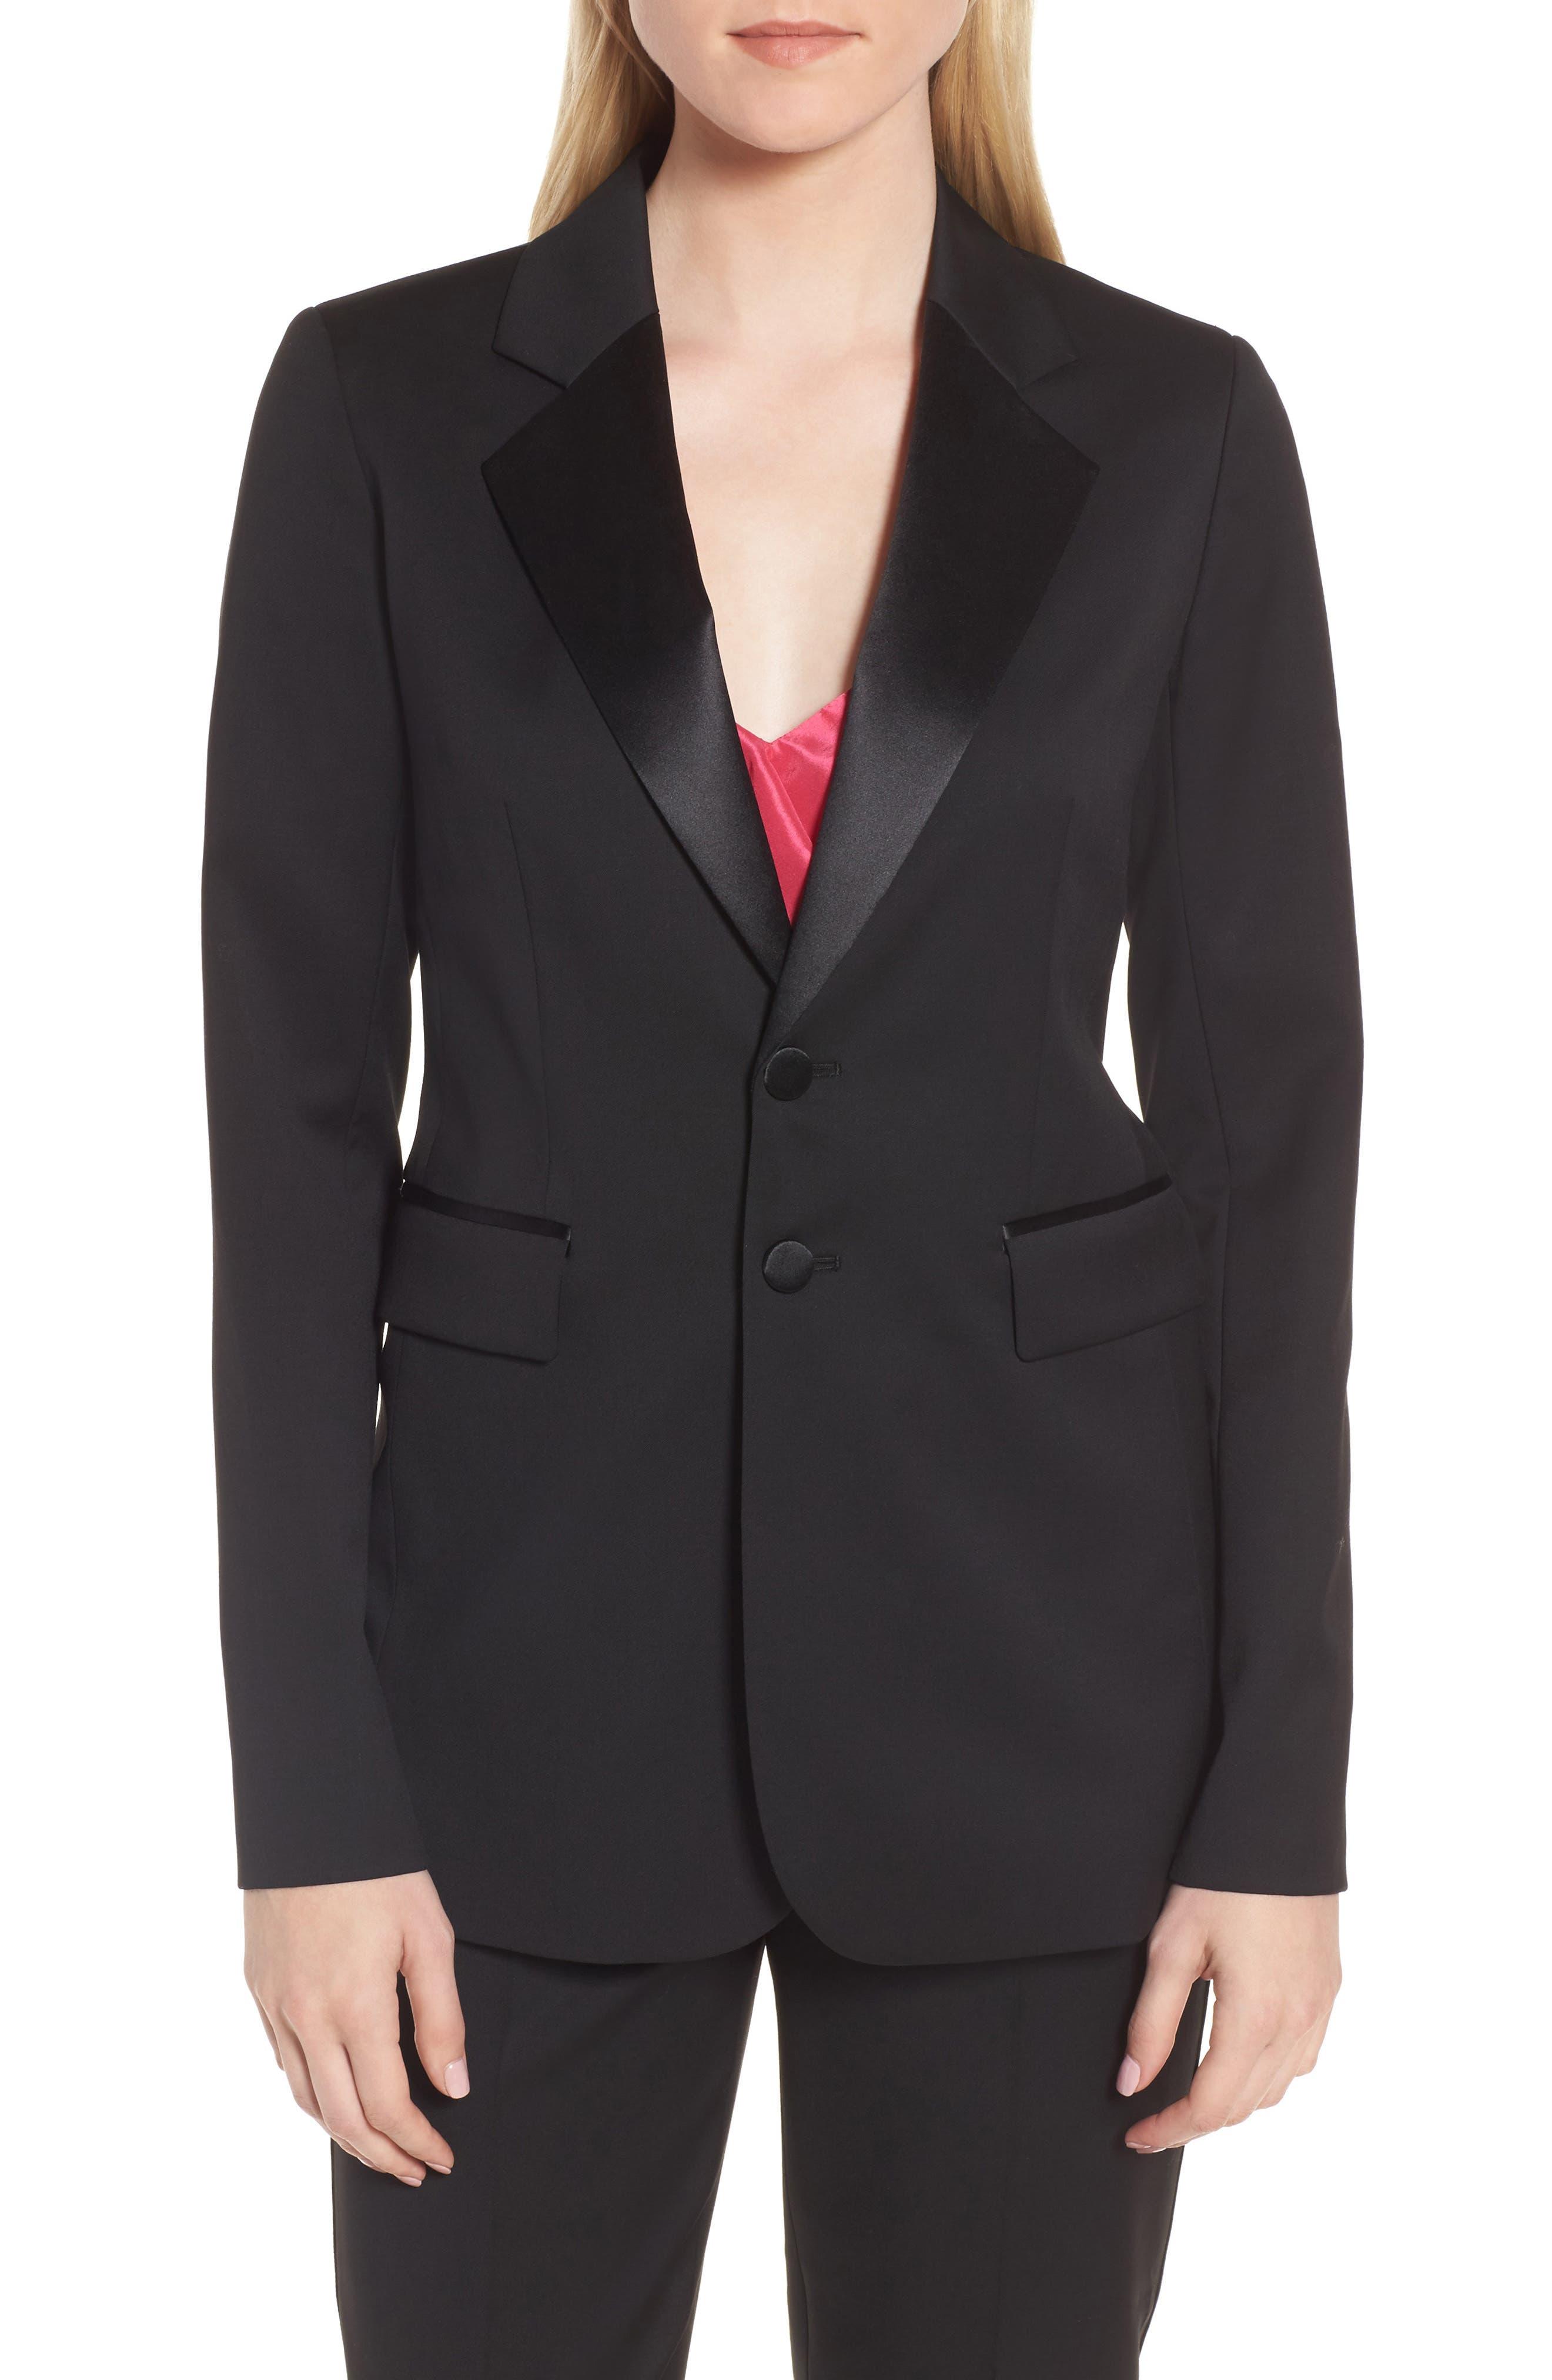 Main Image - Lewit Tuxedo Detail Wool Suit Jacket